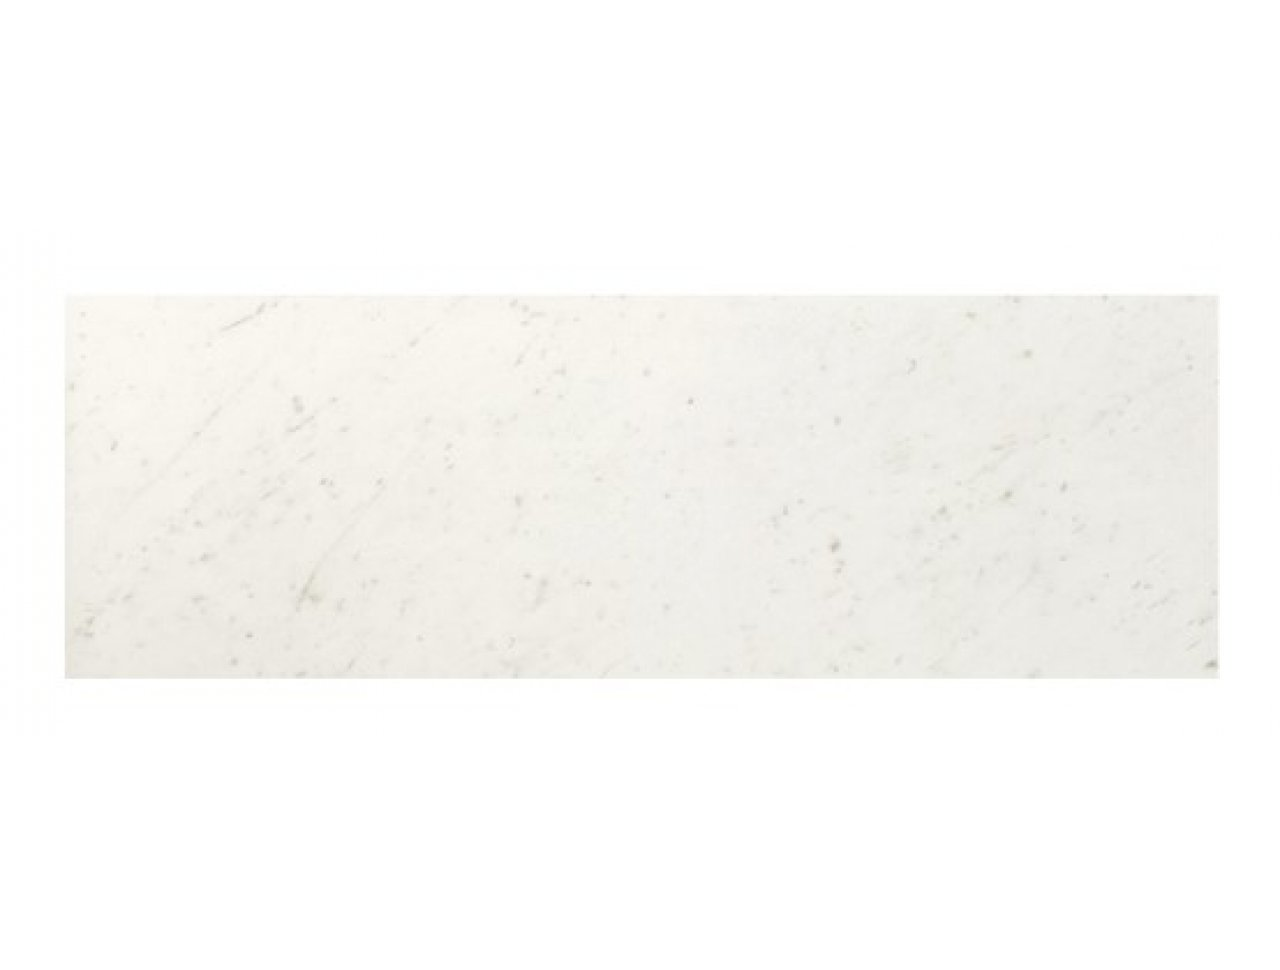 Настенная плитка FAP Roma Diamond Carrara Brillante 75 x 25 см, Арт. fNHR